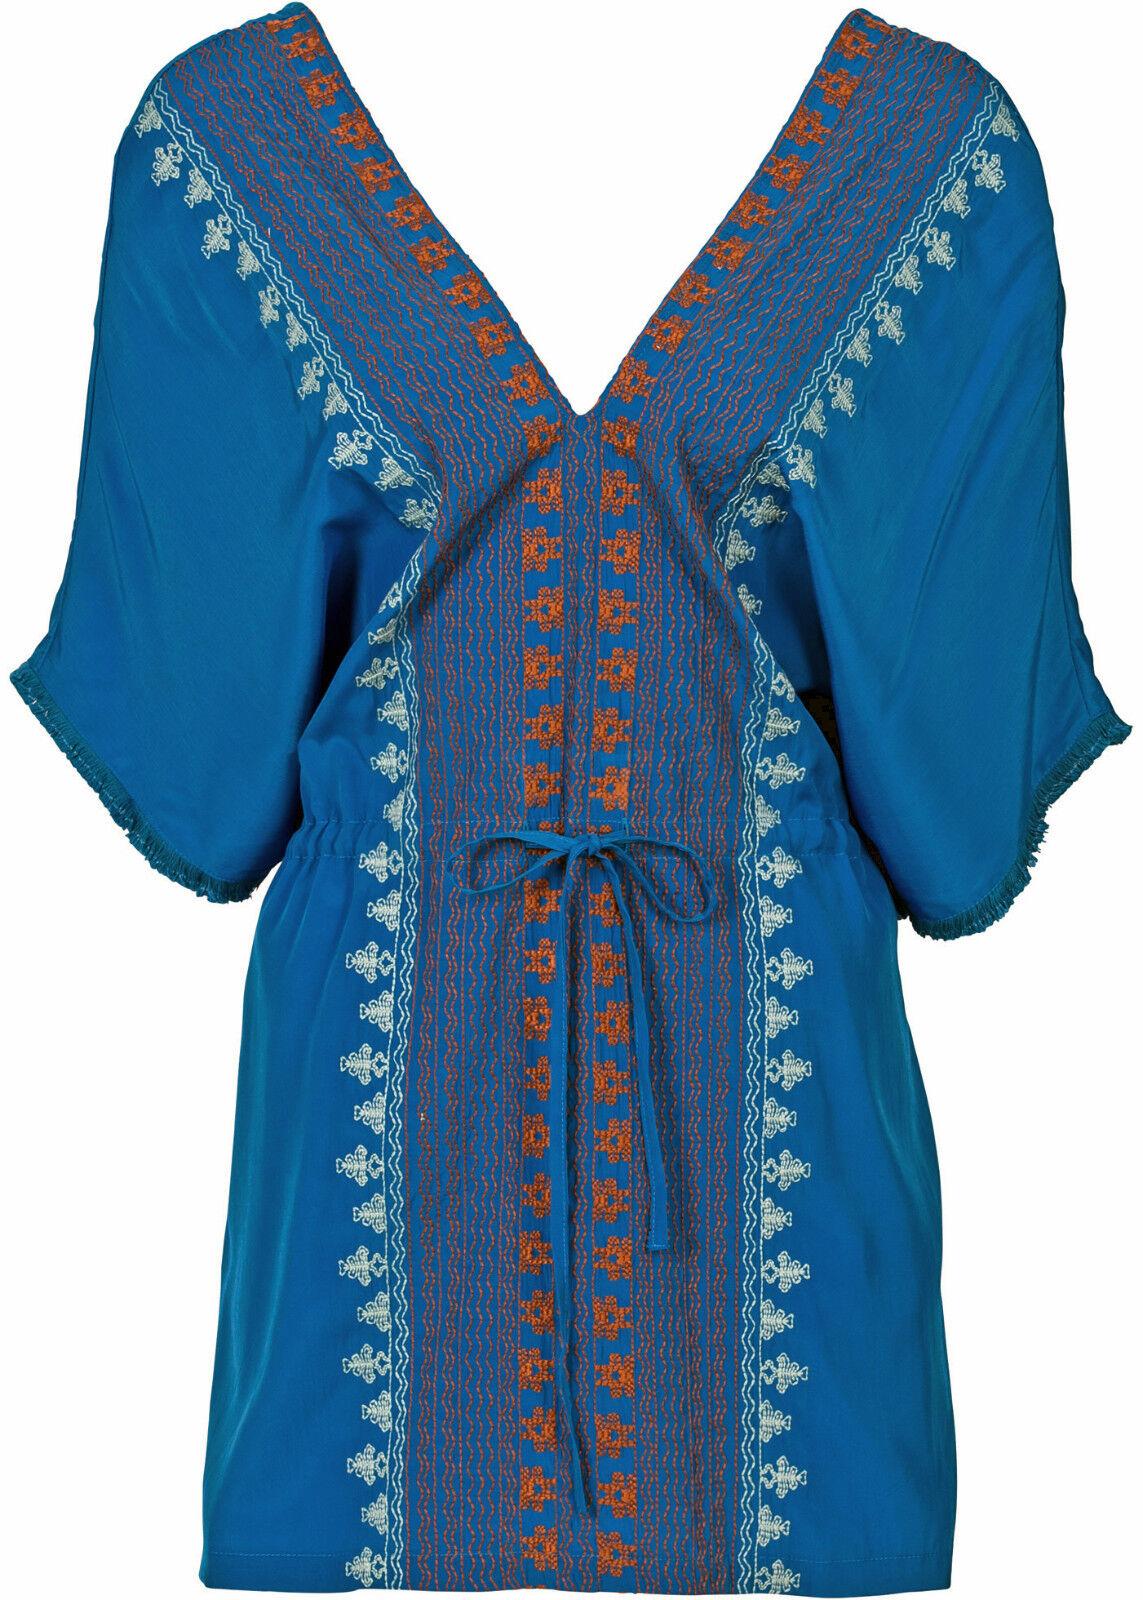 Tunika Longbluse Strandkleid Hippie Boho Style azurblau Gr.48/50 NEU 934828